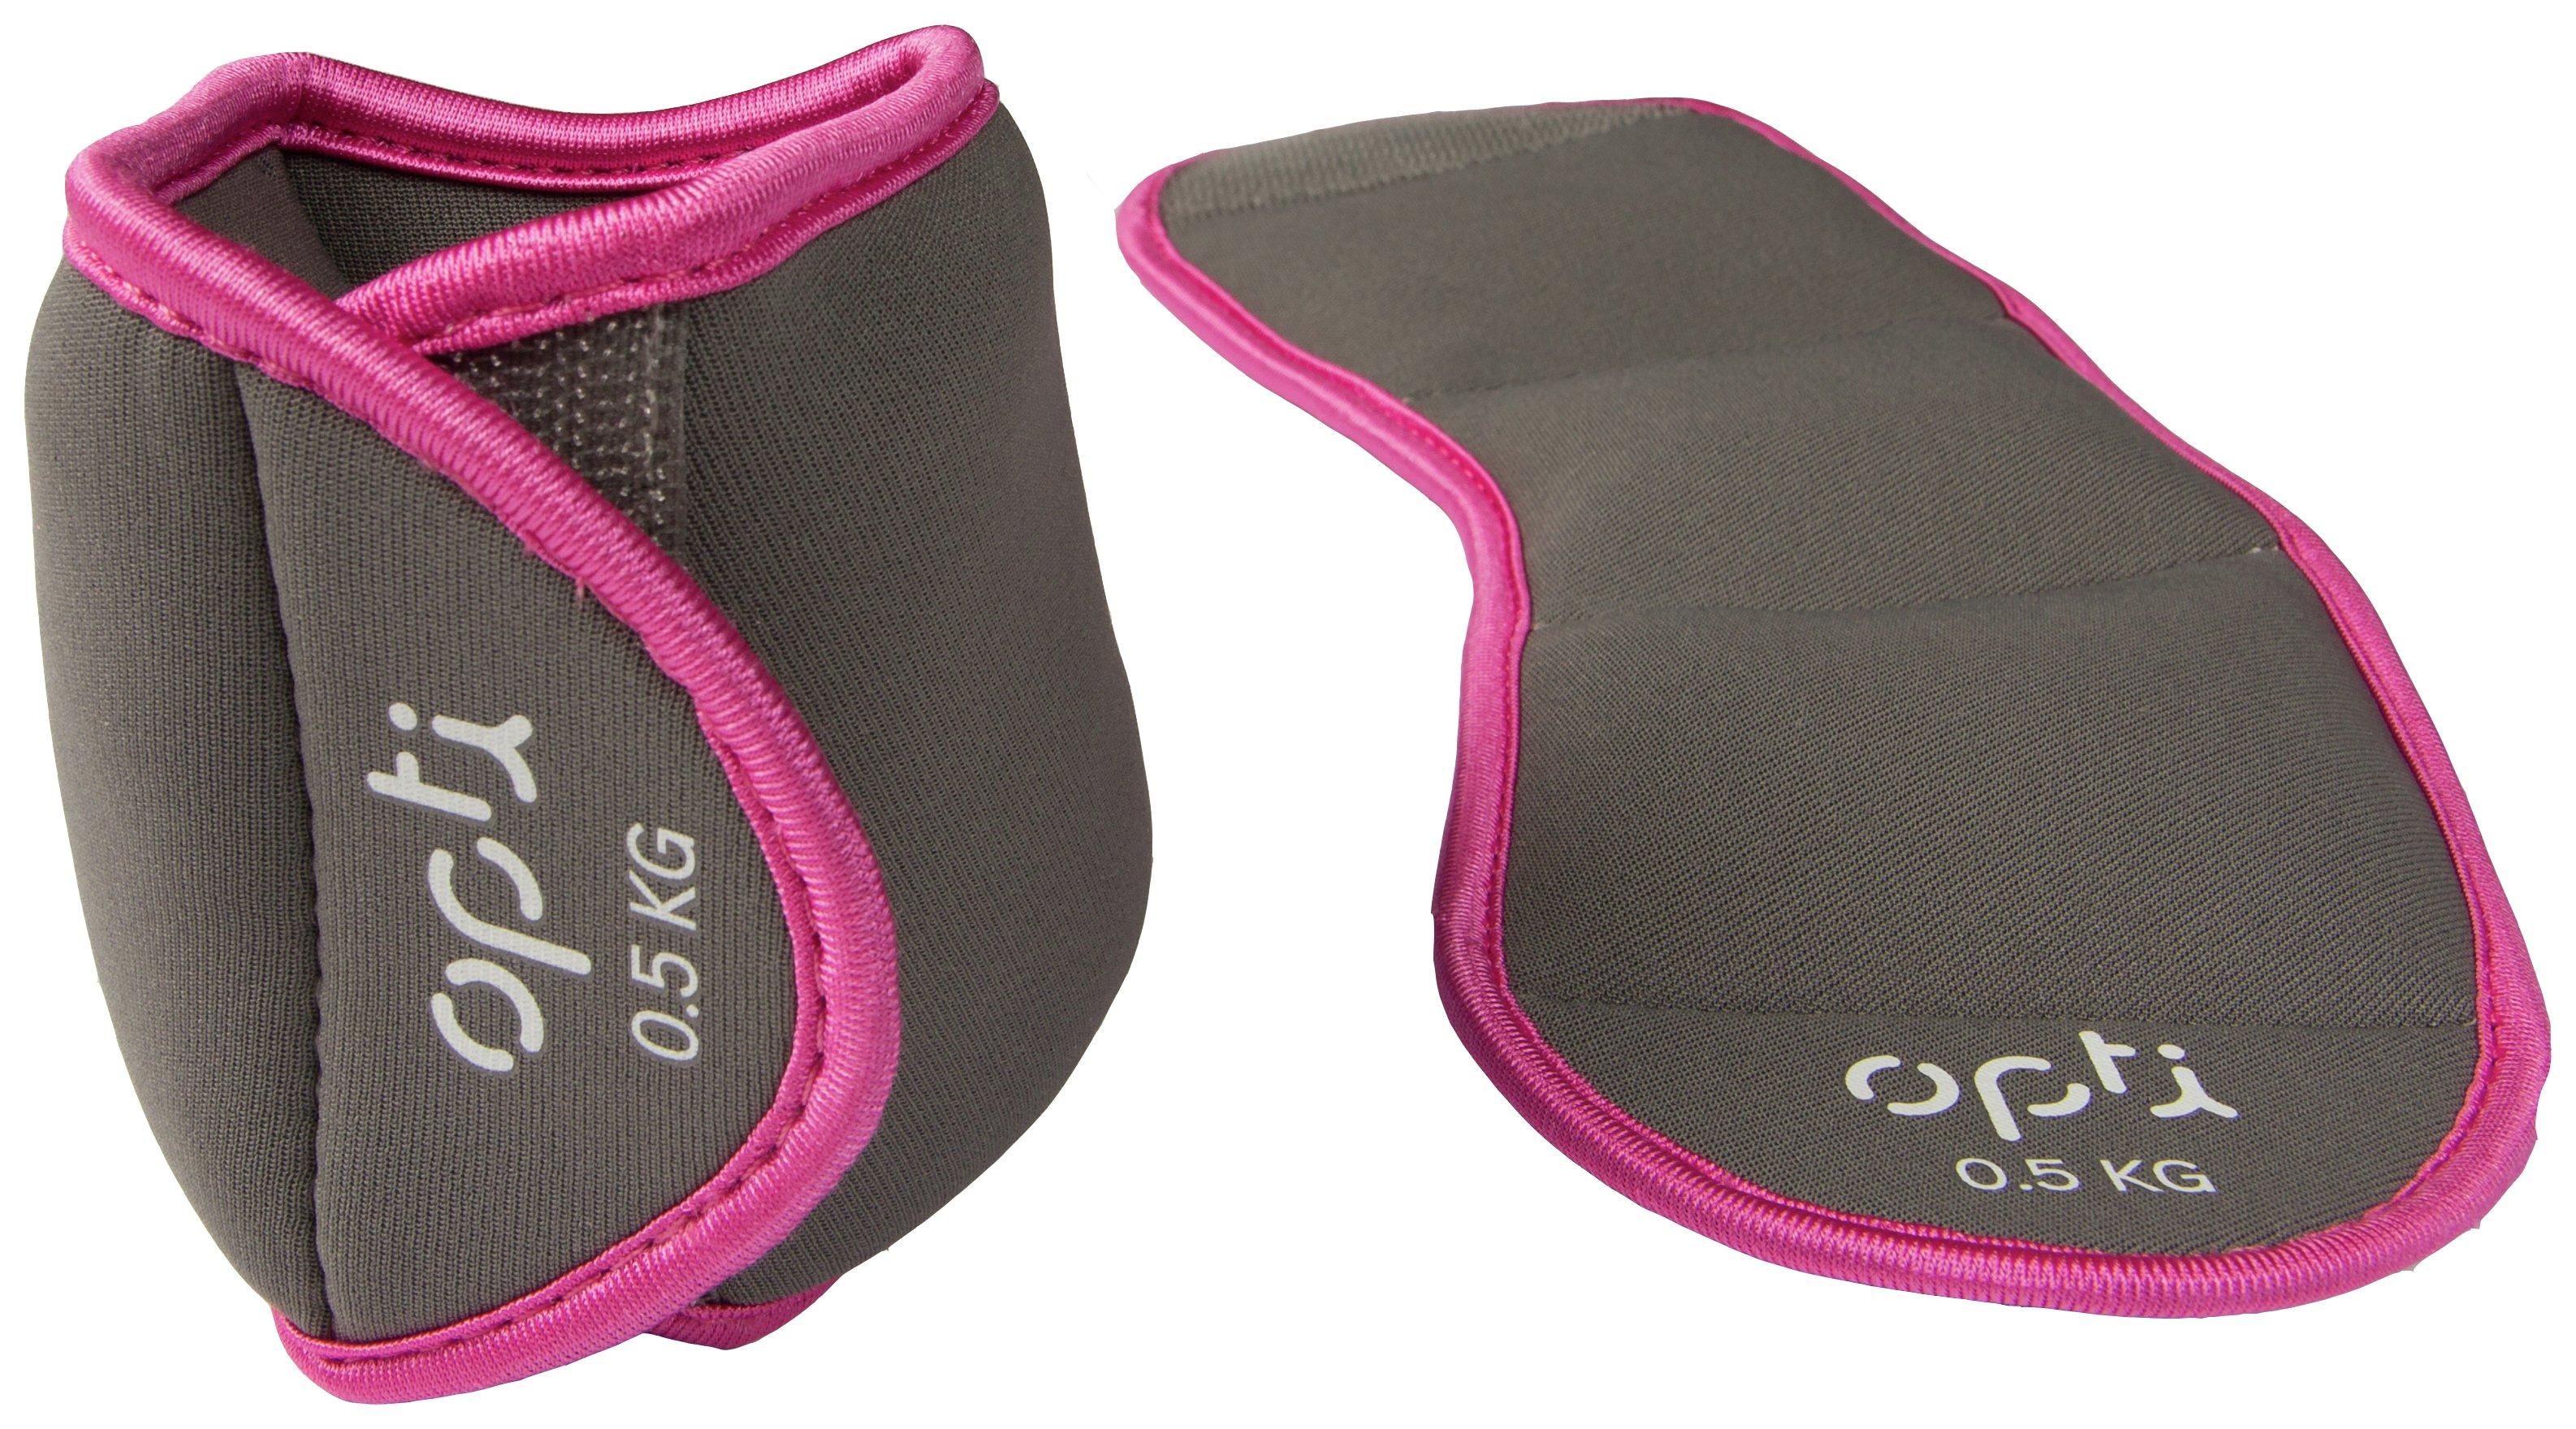 Opti - Wrist Weights 2 x 05kg - Pink lowest price